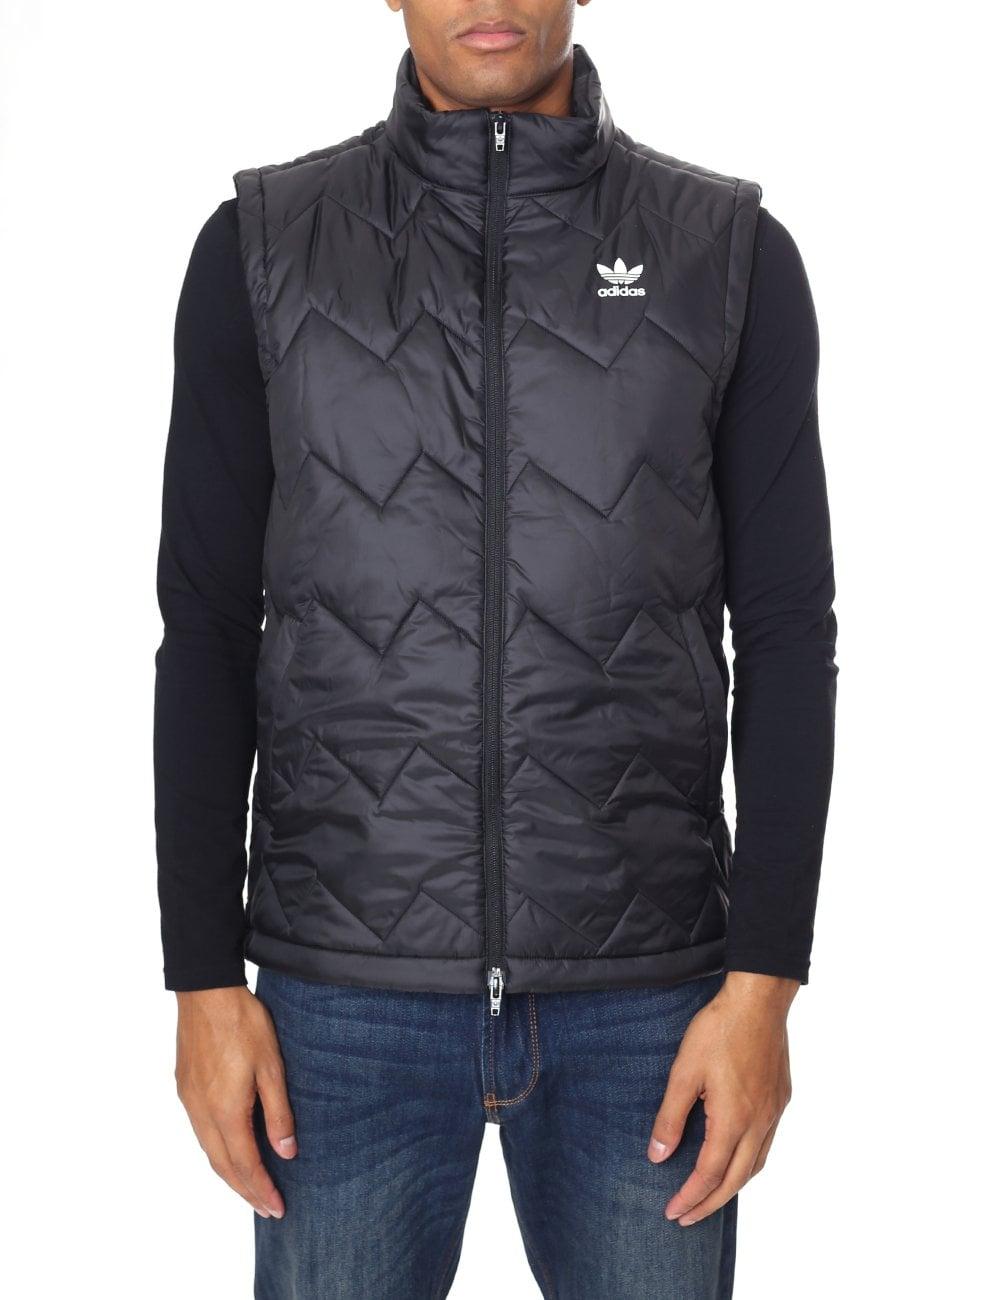 Adidas MEN'S SST PUFFY VEST